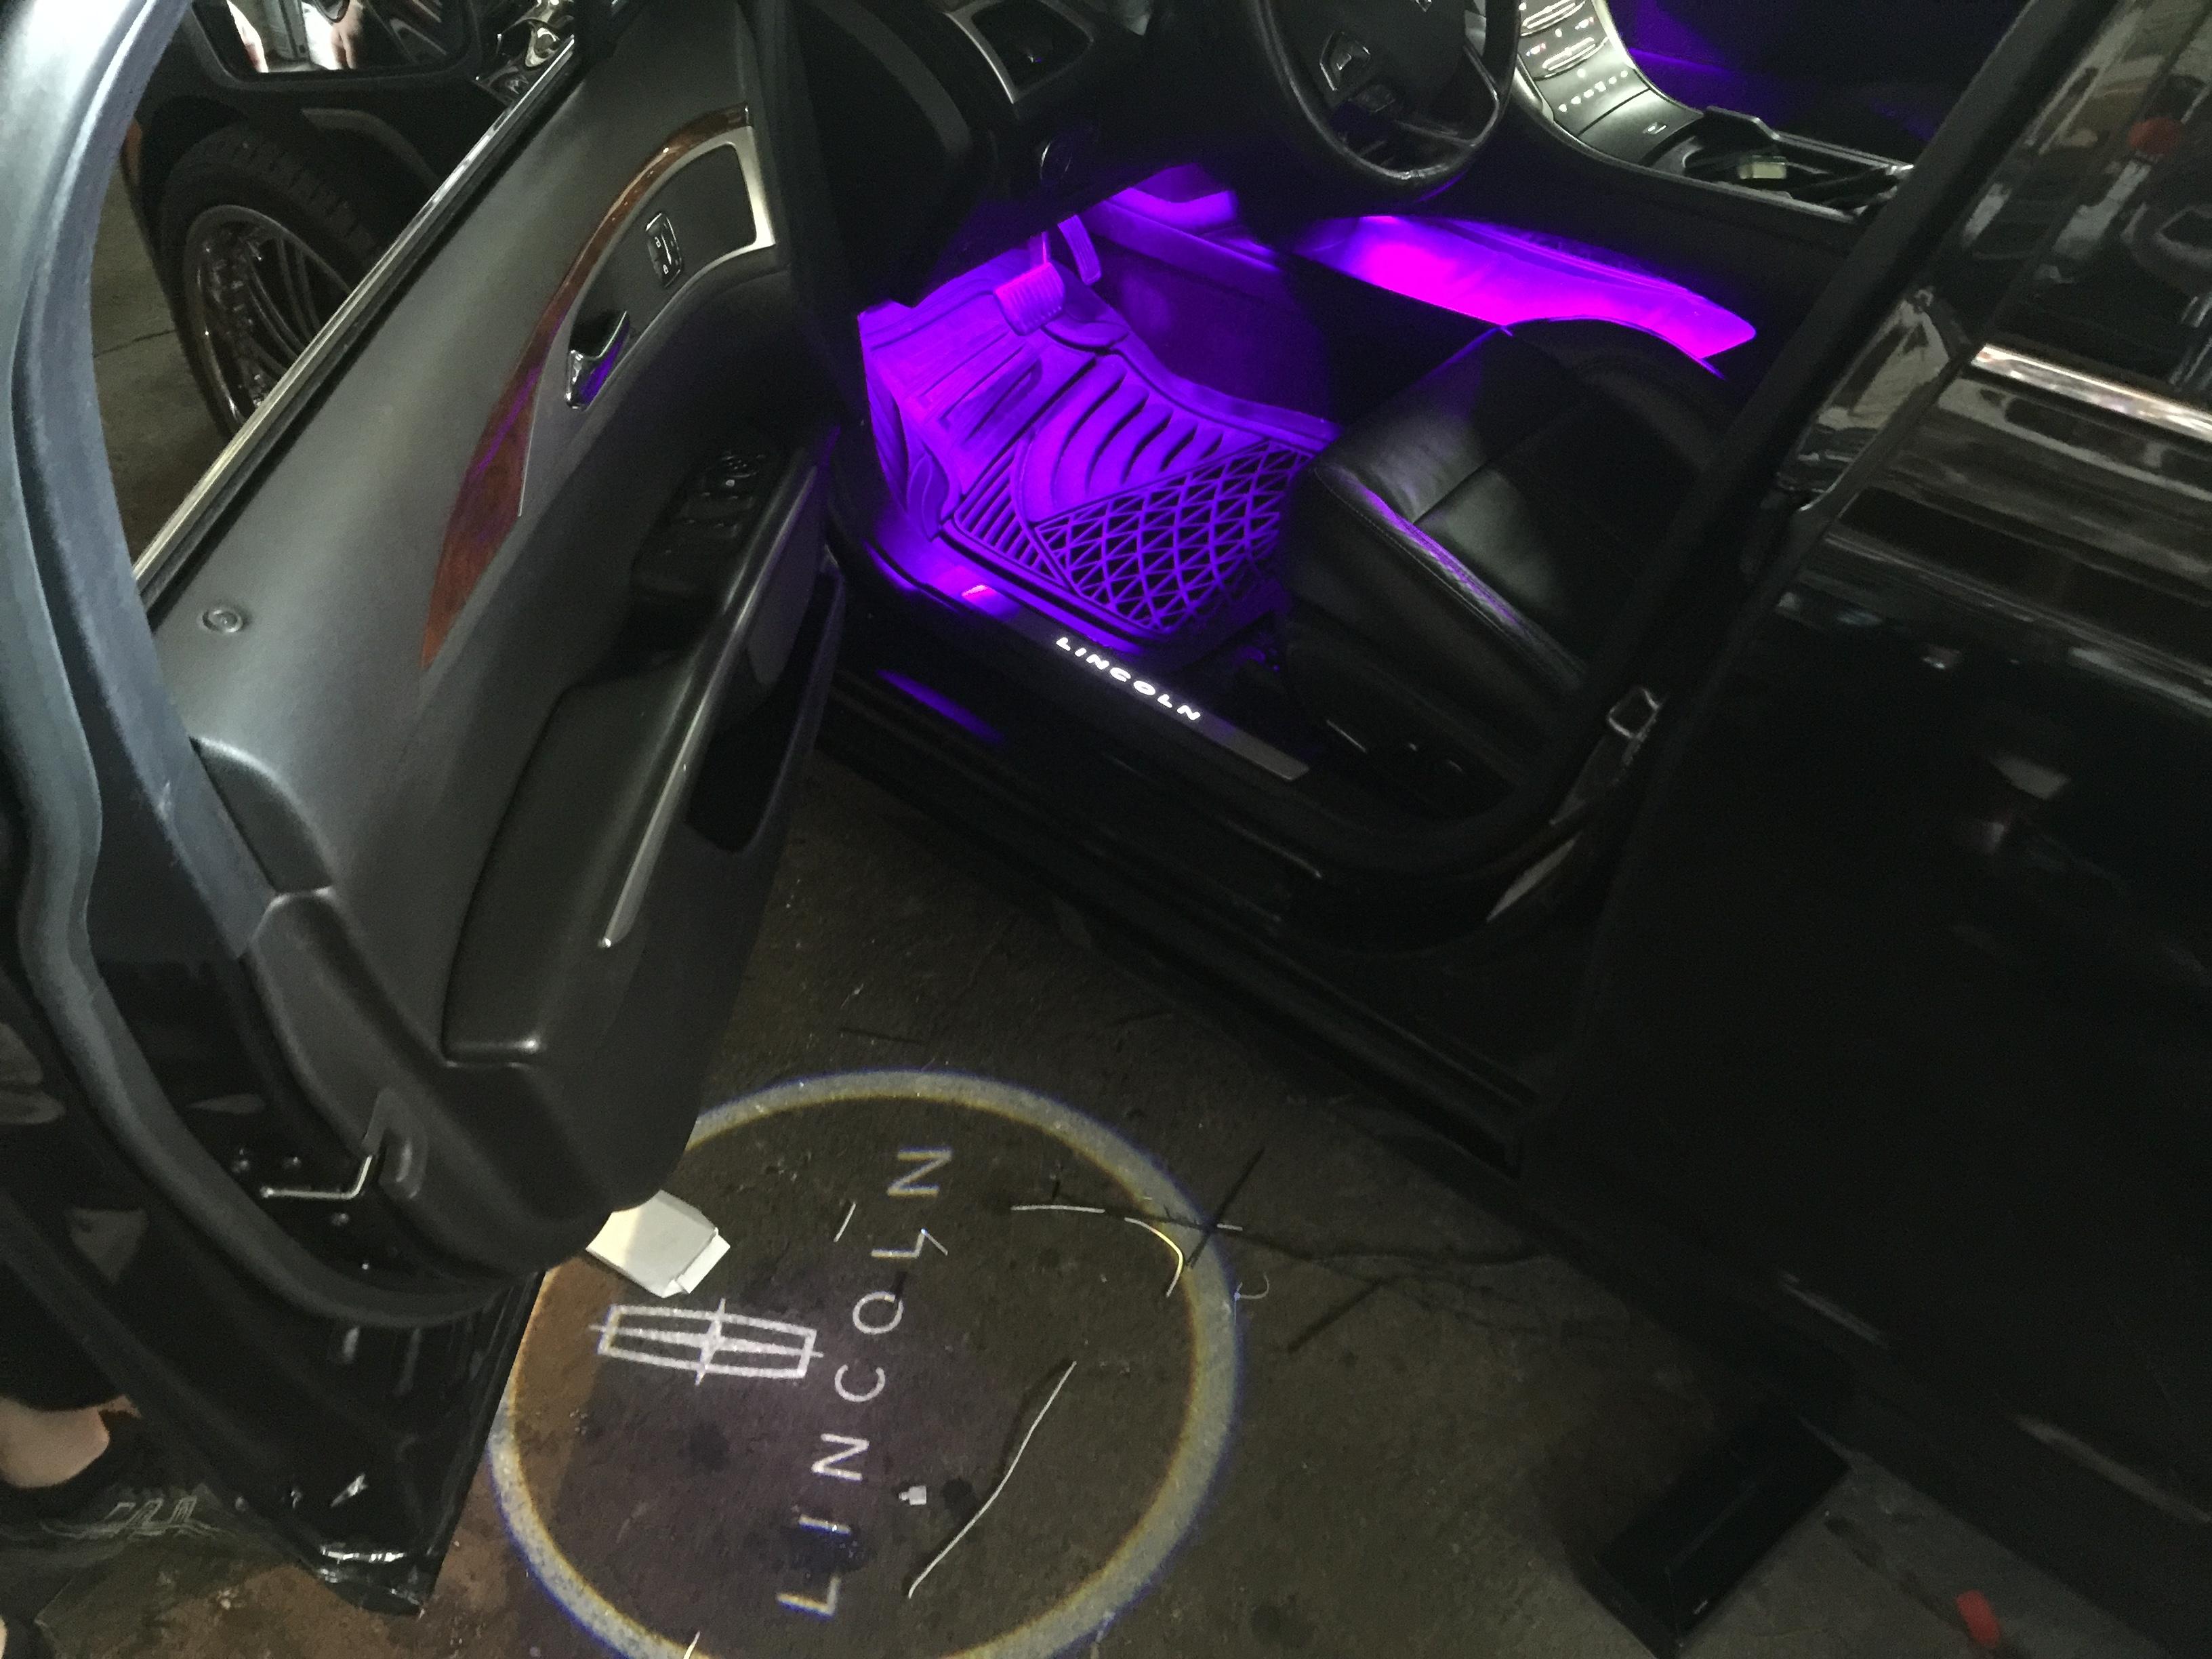 Blog High End Car Stereos Alarms Philadelphia Car Stereos And Performance Mods